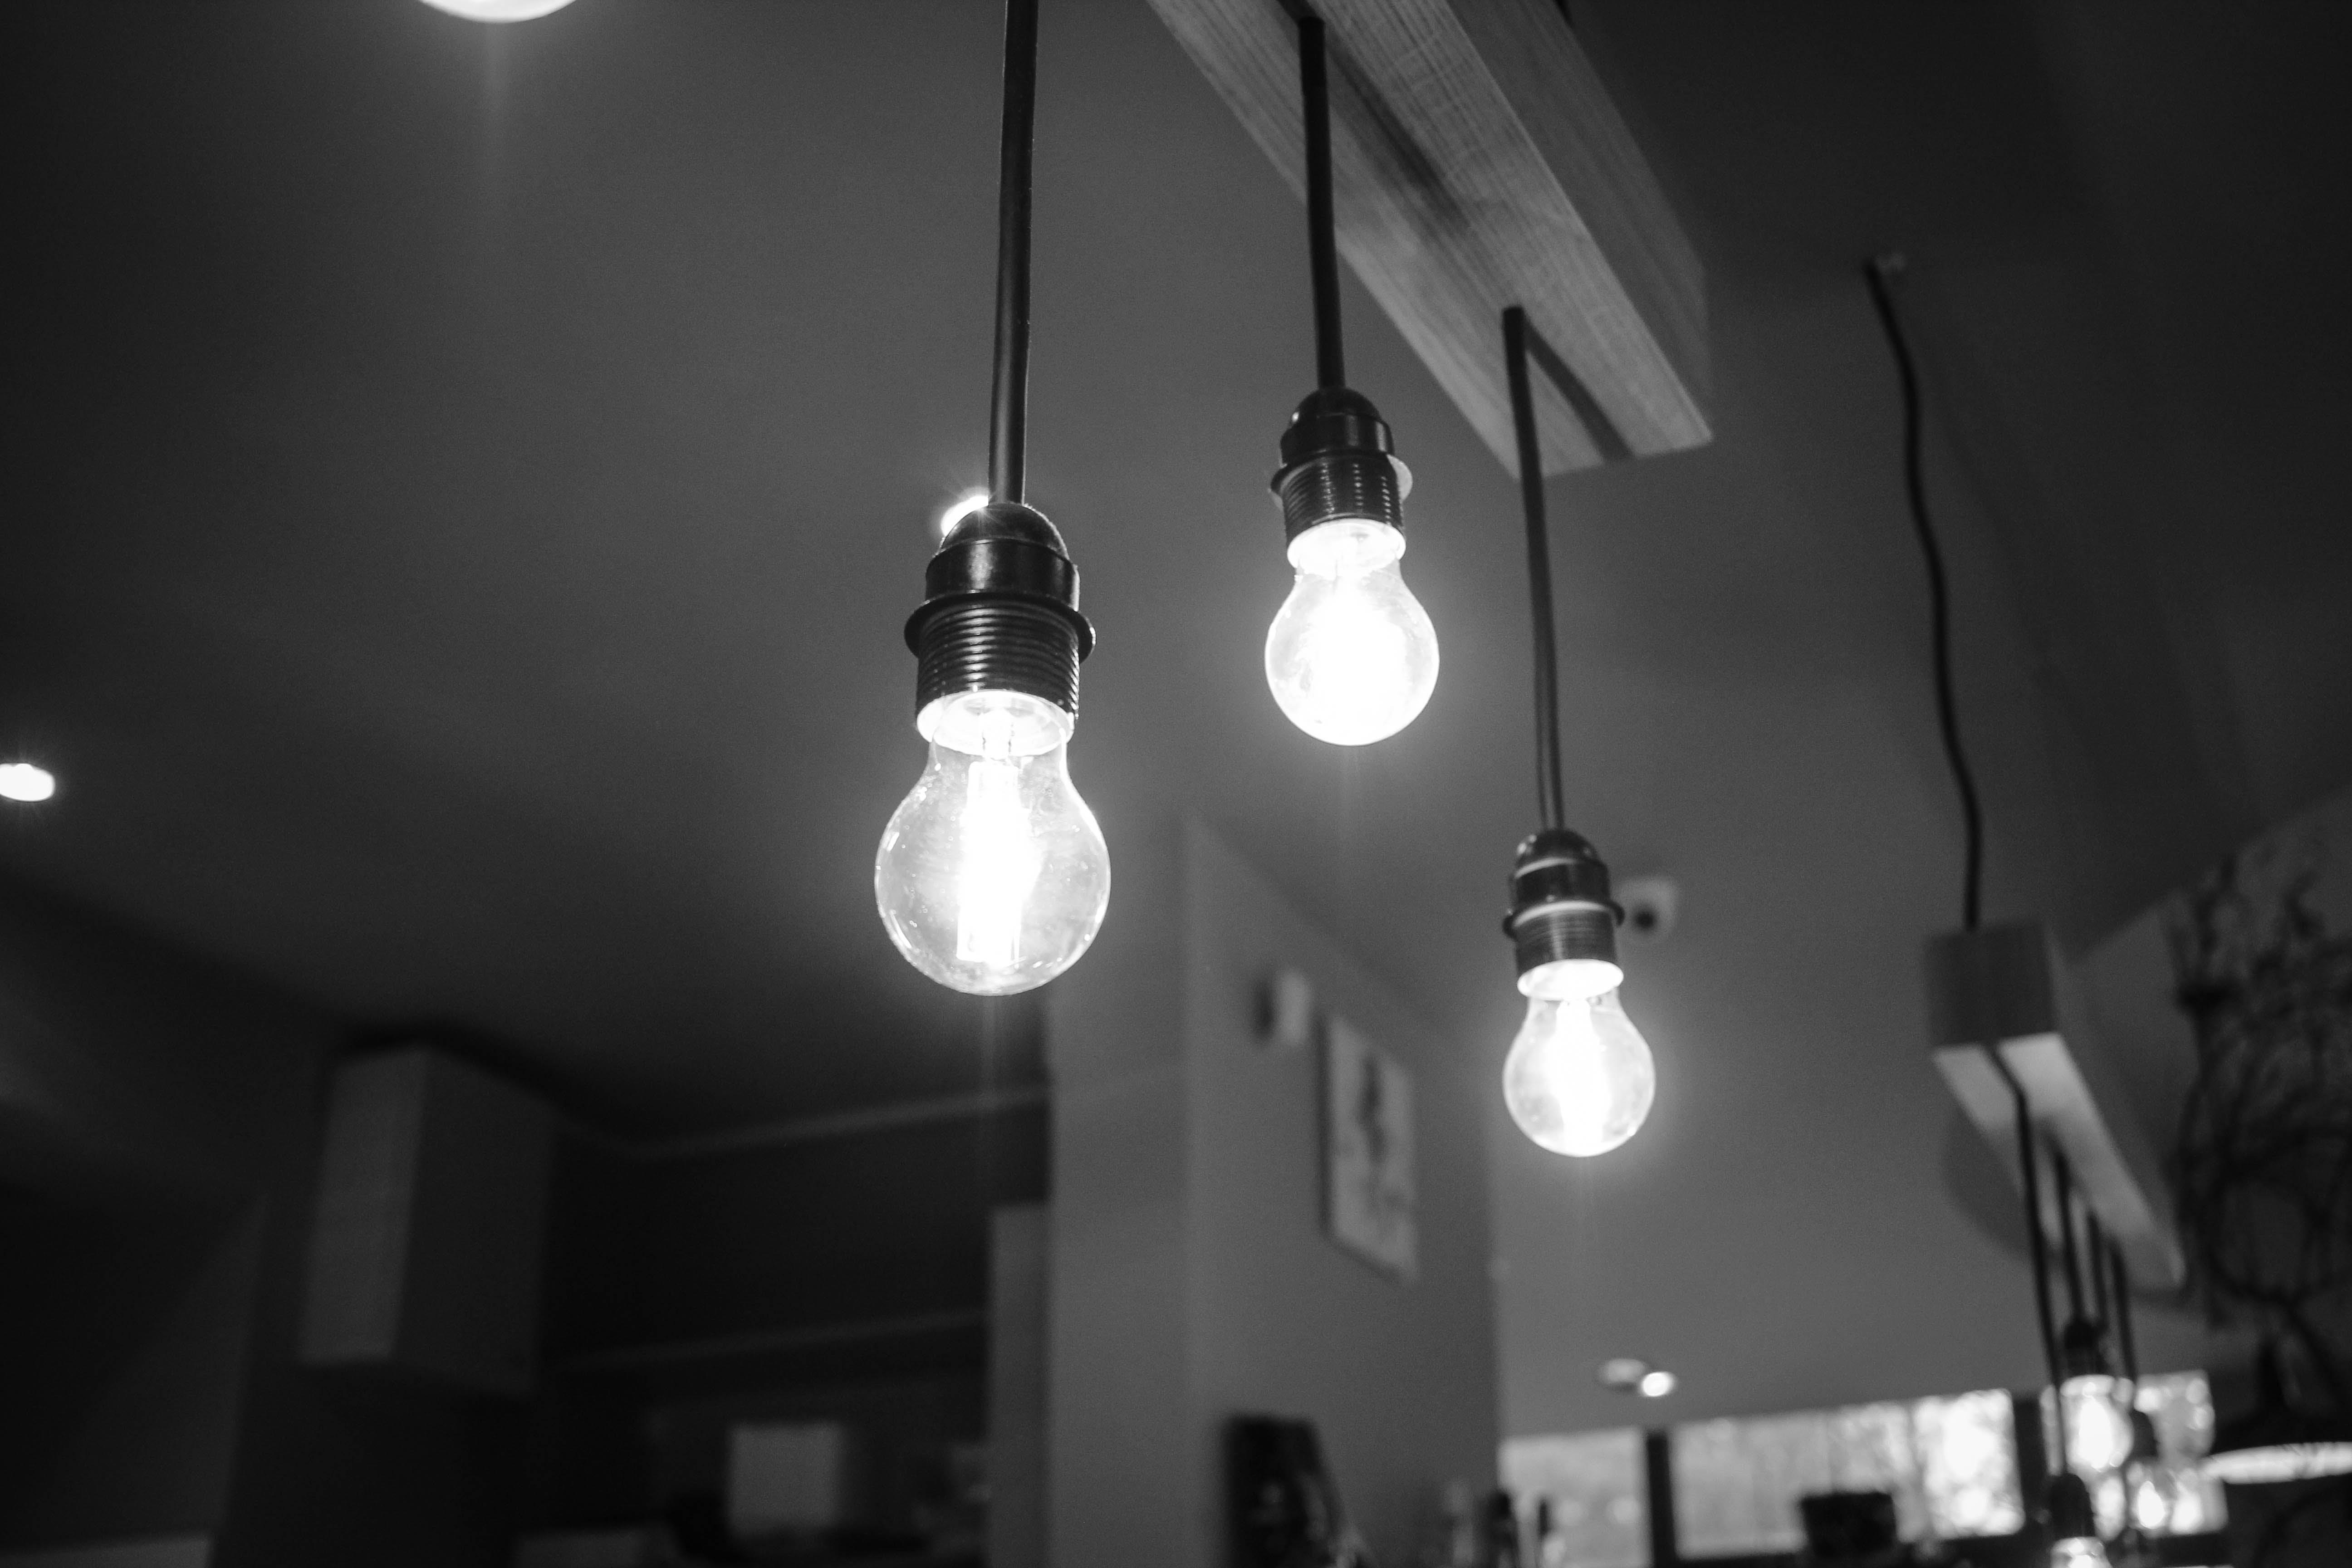 black-and-white, blur, bright